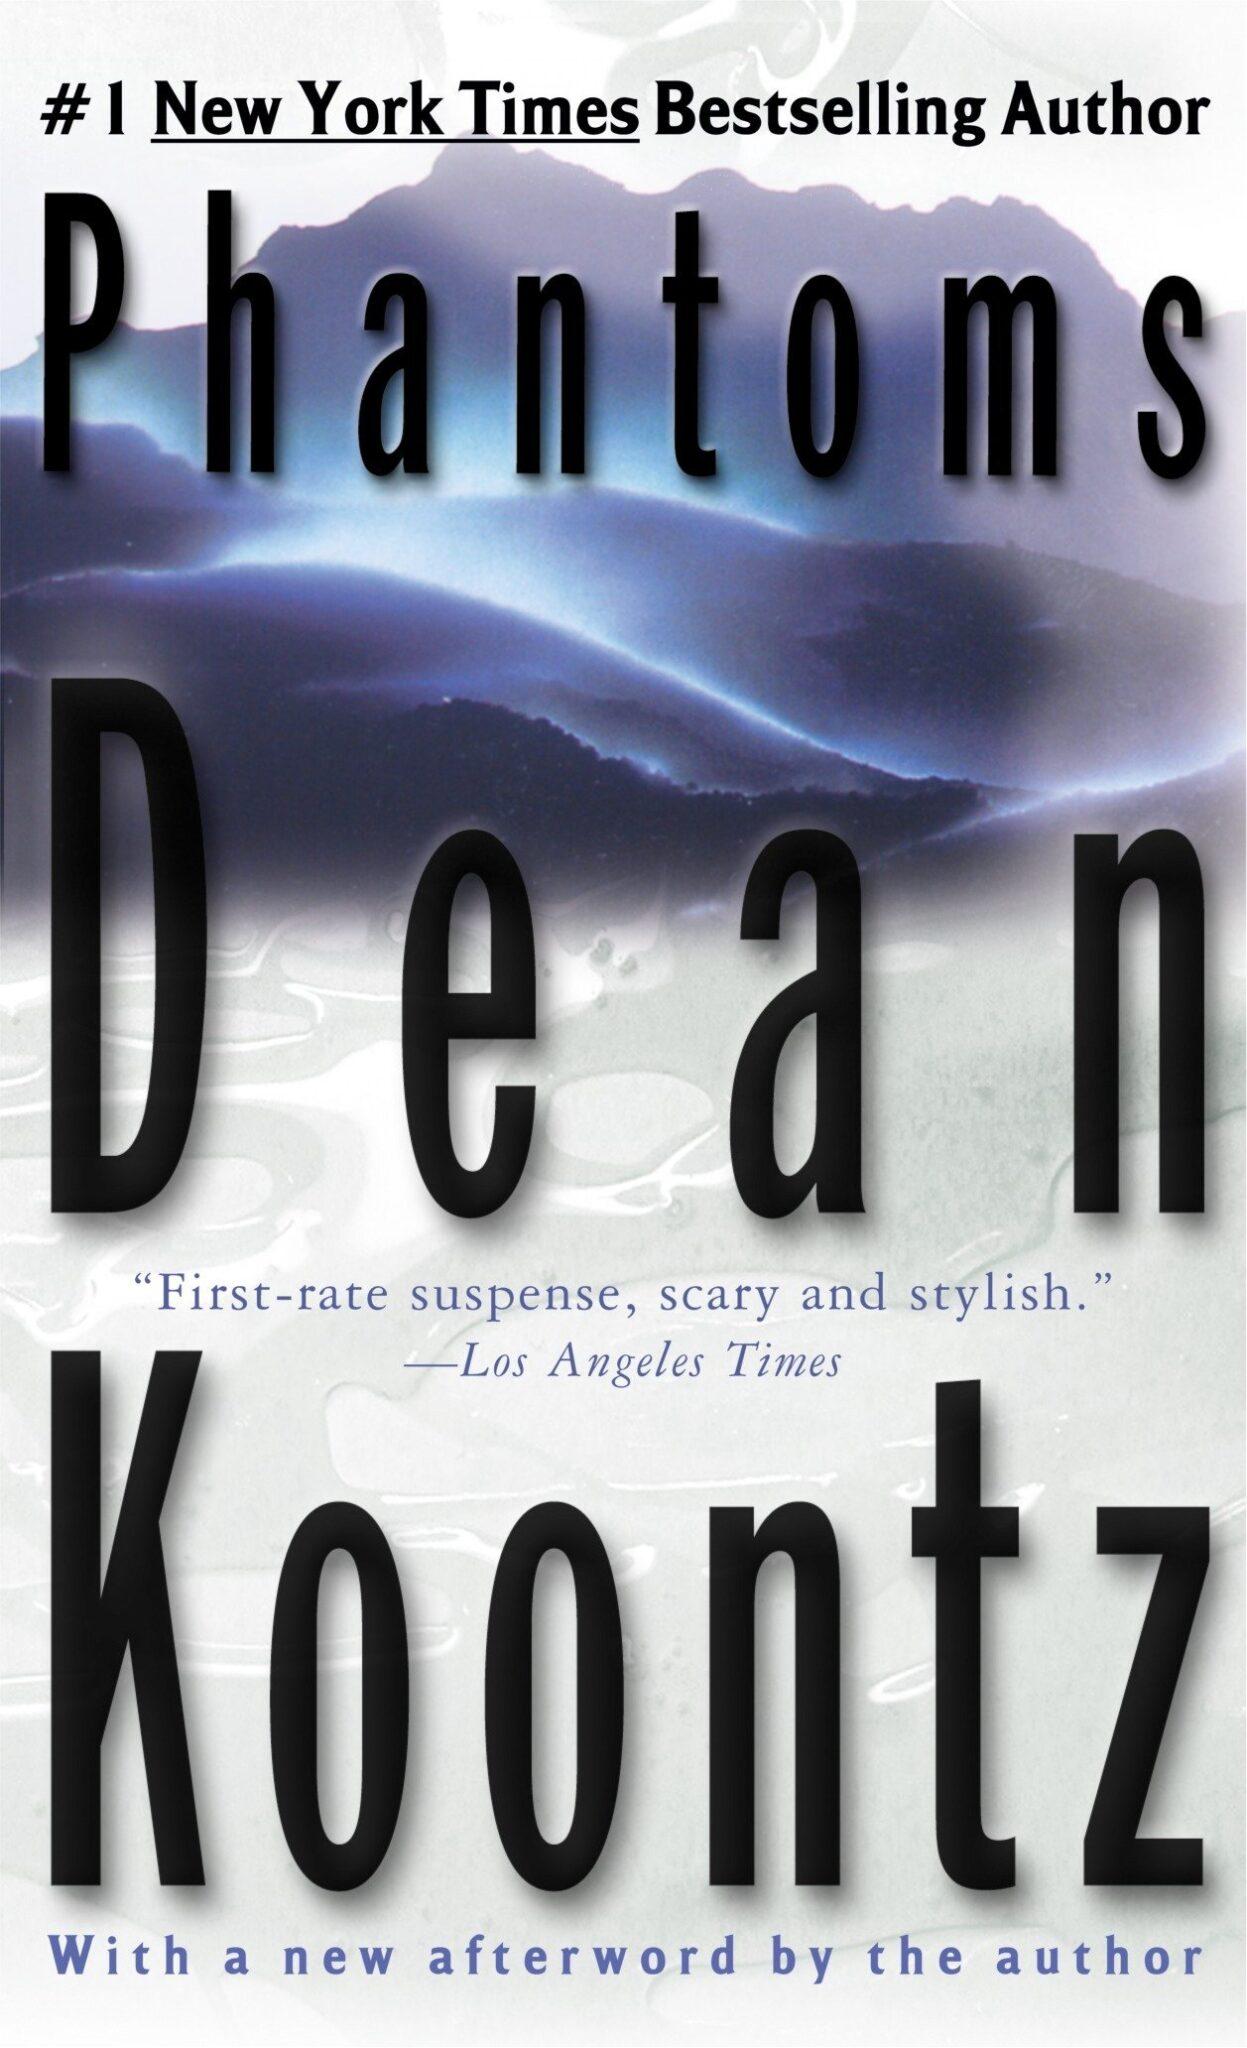 Dean Koontz books 27